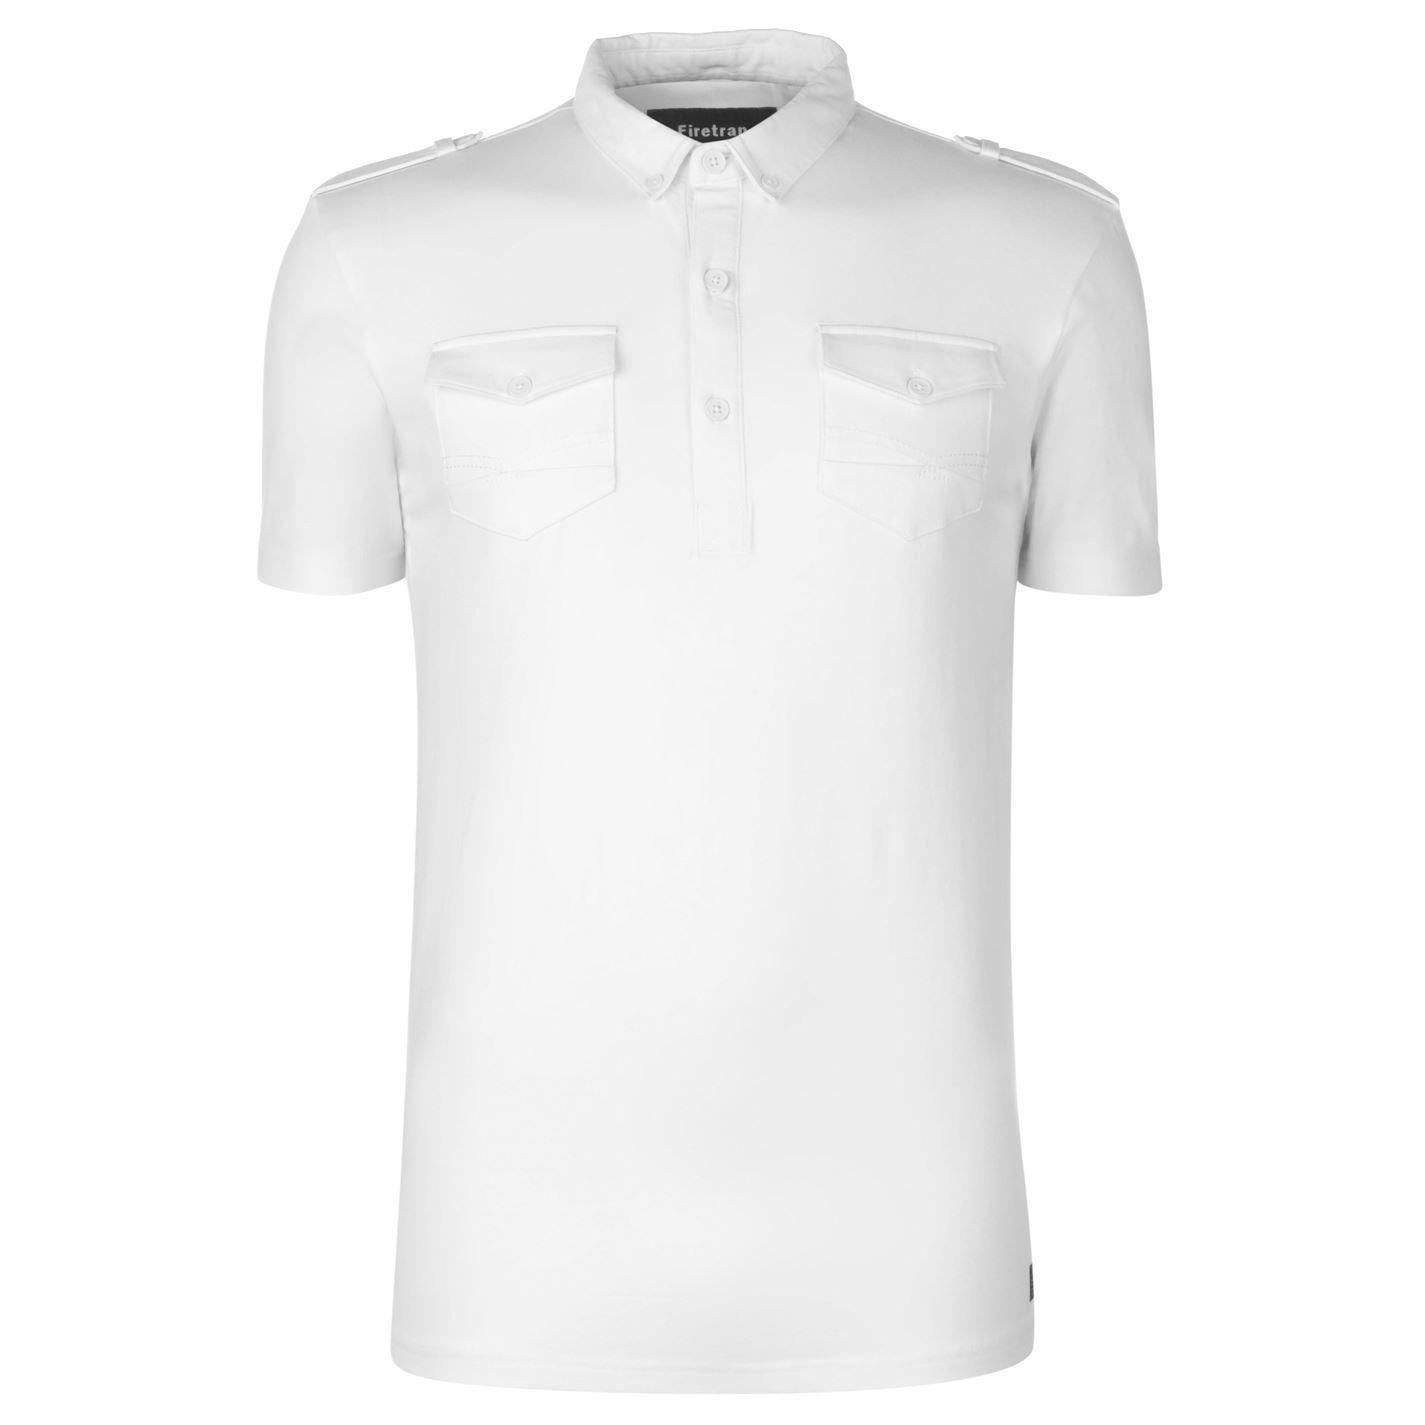 thumbnail 13 - Firetrap-Double-Pocket-Polo-Shirt-Mens-Collar-Top-Tee-Black-Medium